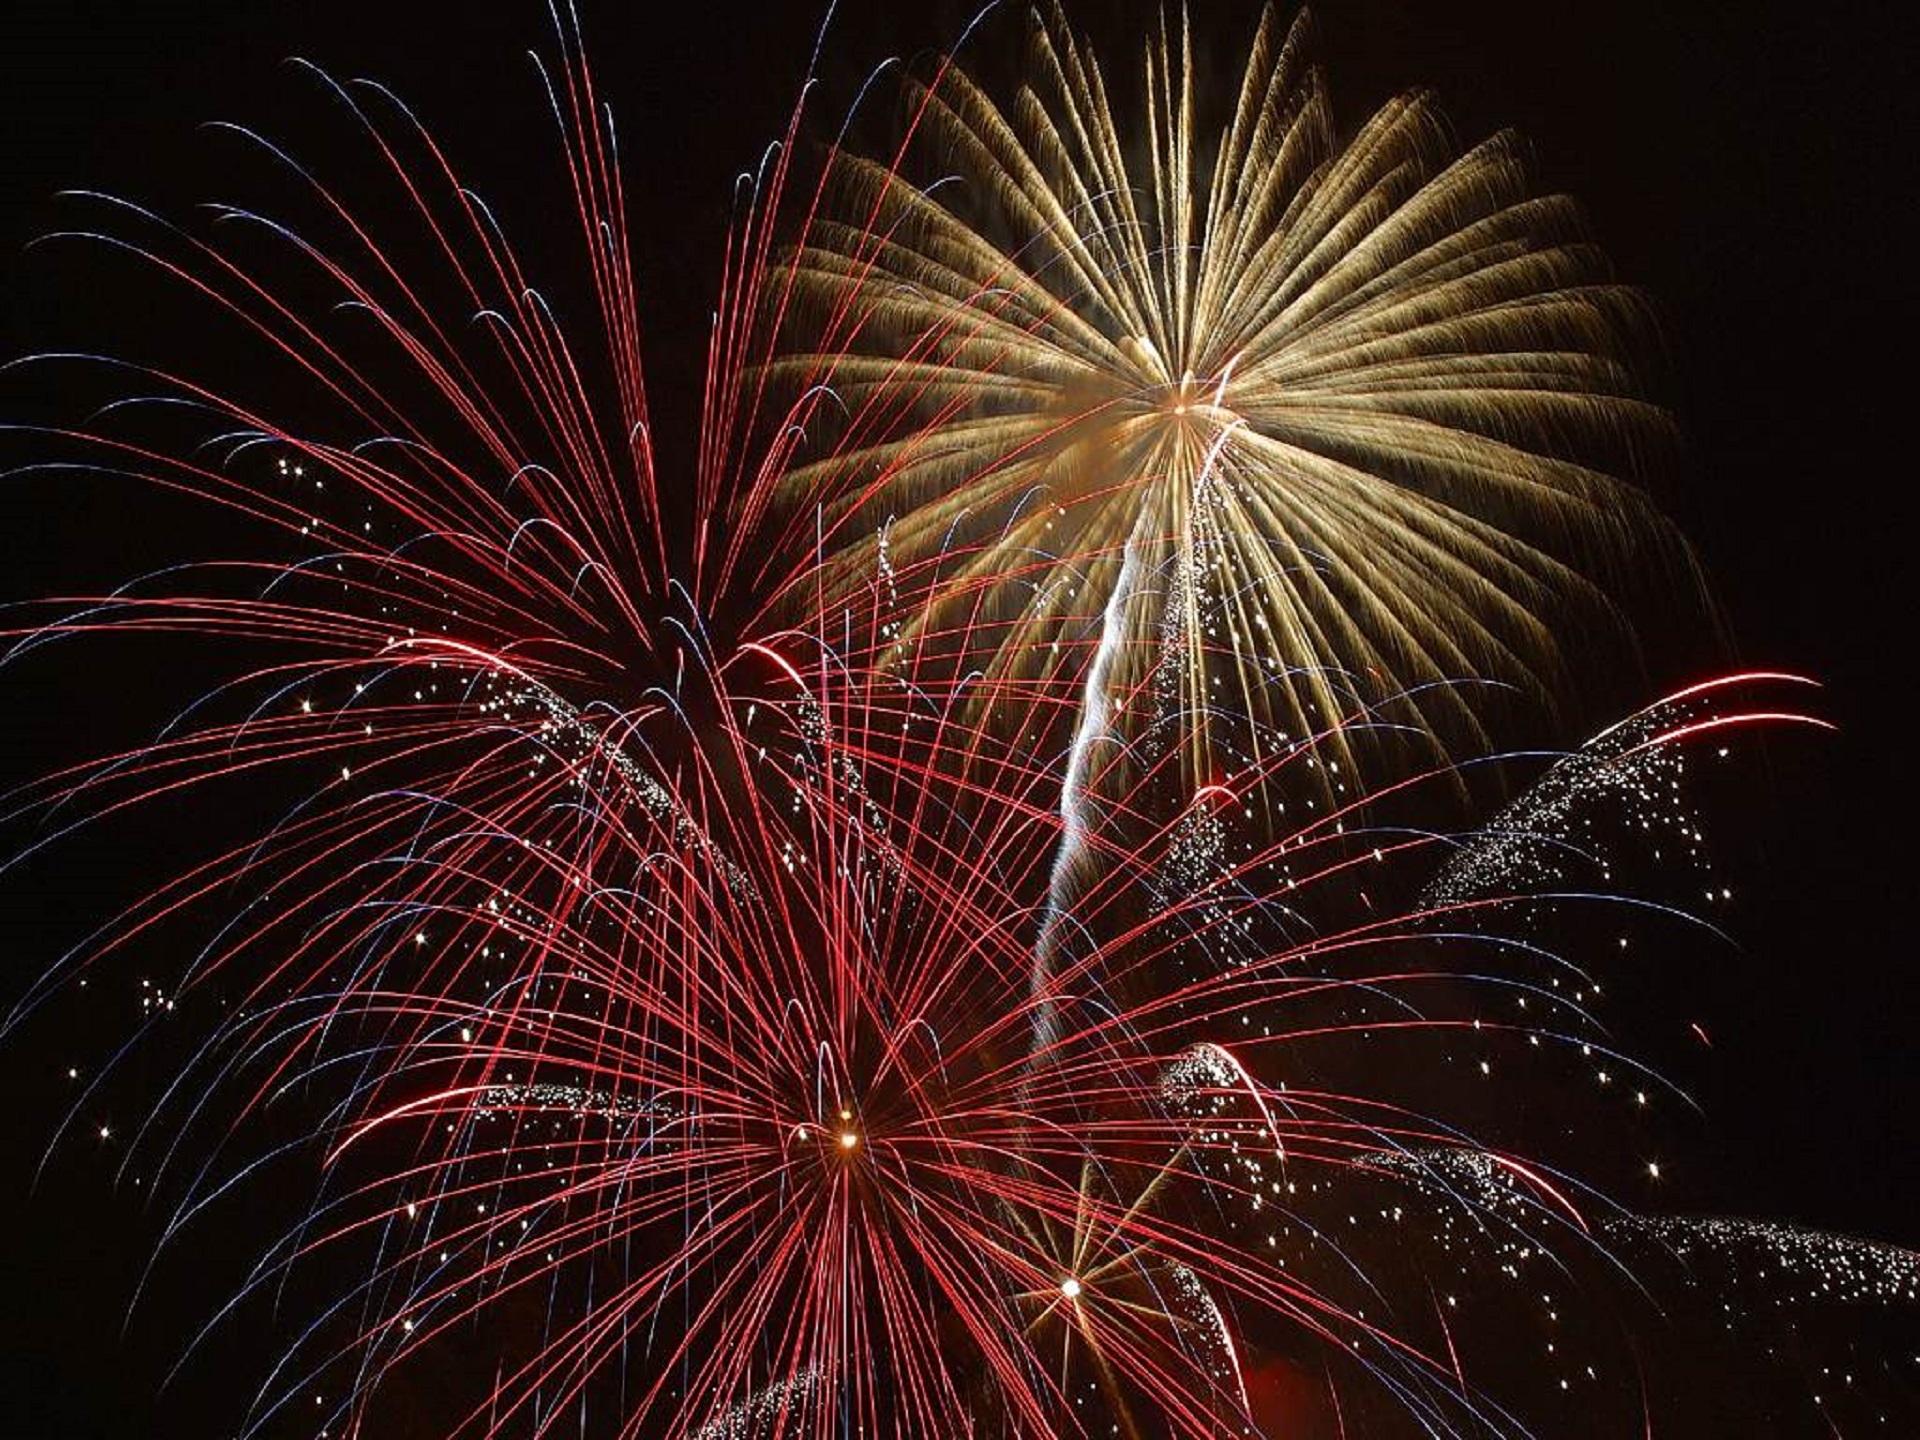 Jones Beach Fireworks Show Time, Parking & Other Tips